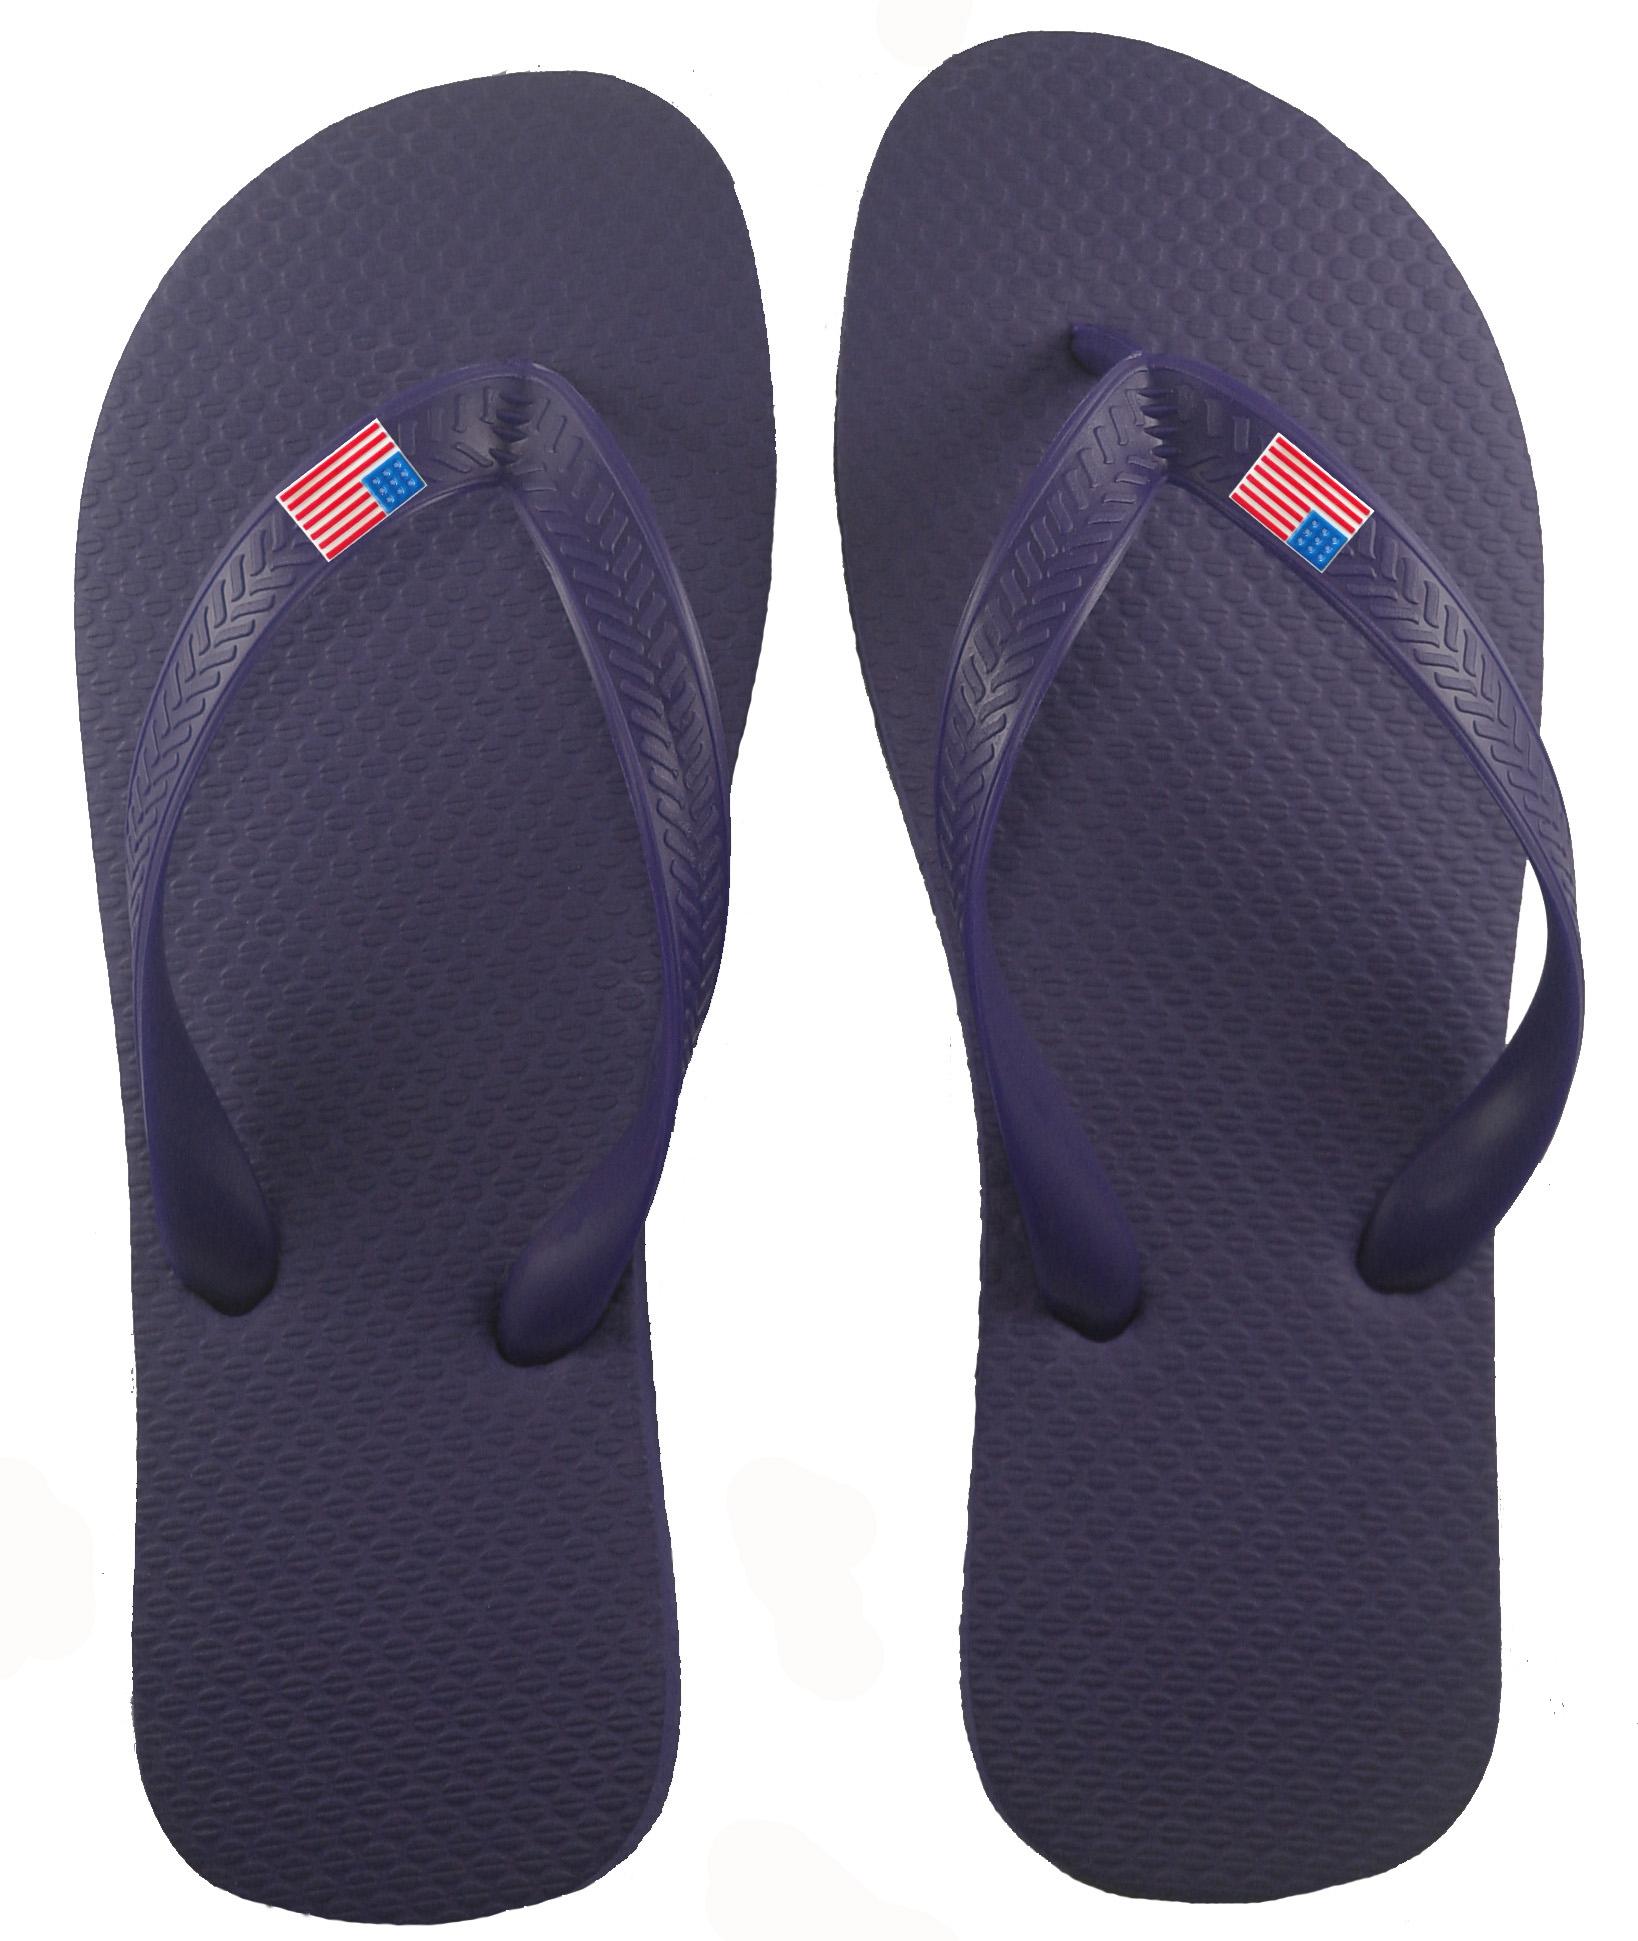 ec5baf26fa4b USA Flip-Flop - INBOP Flip-Flops